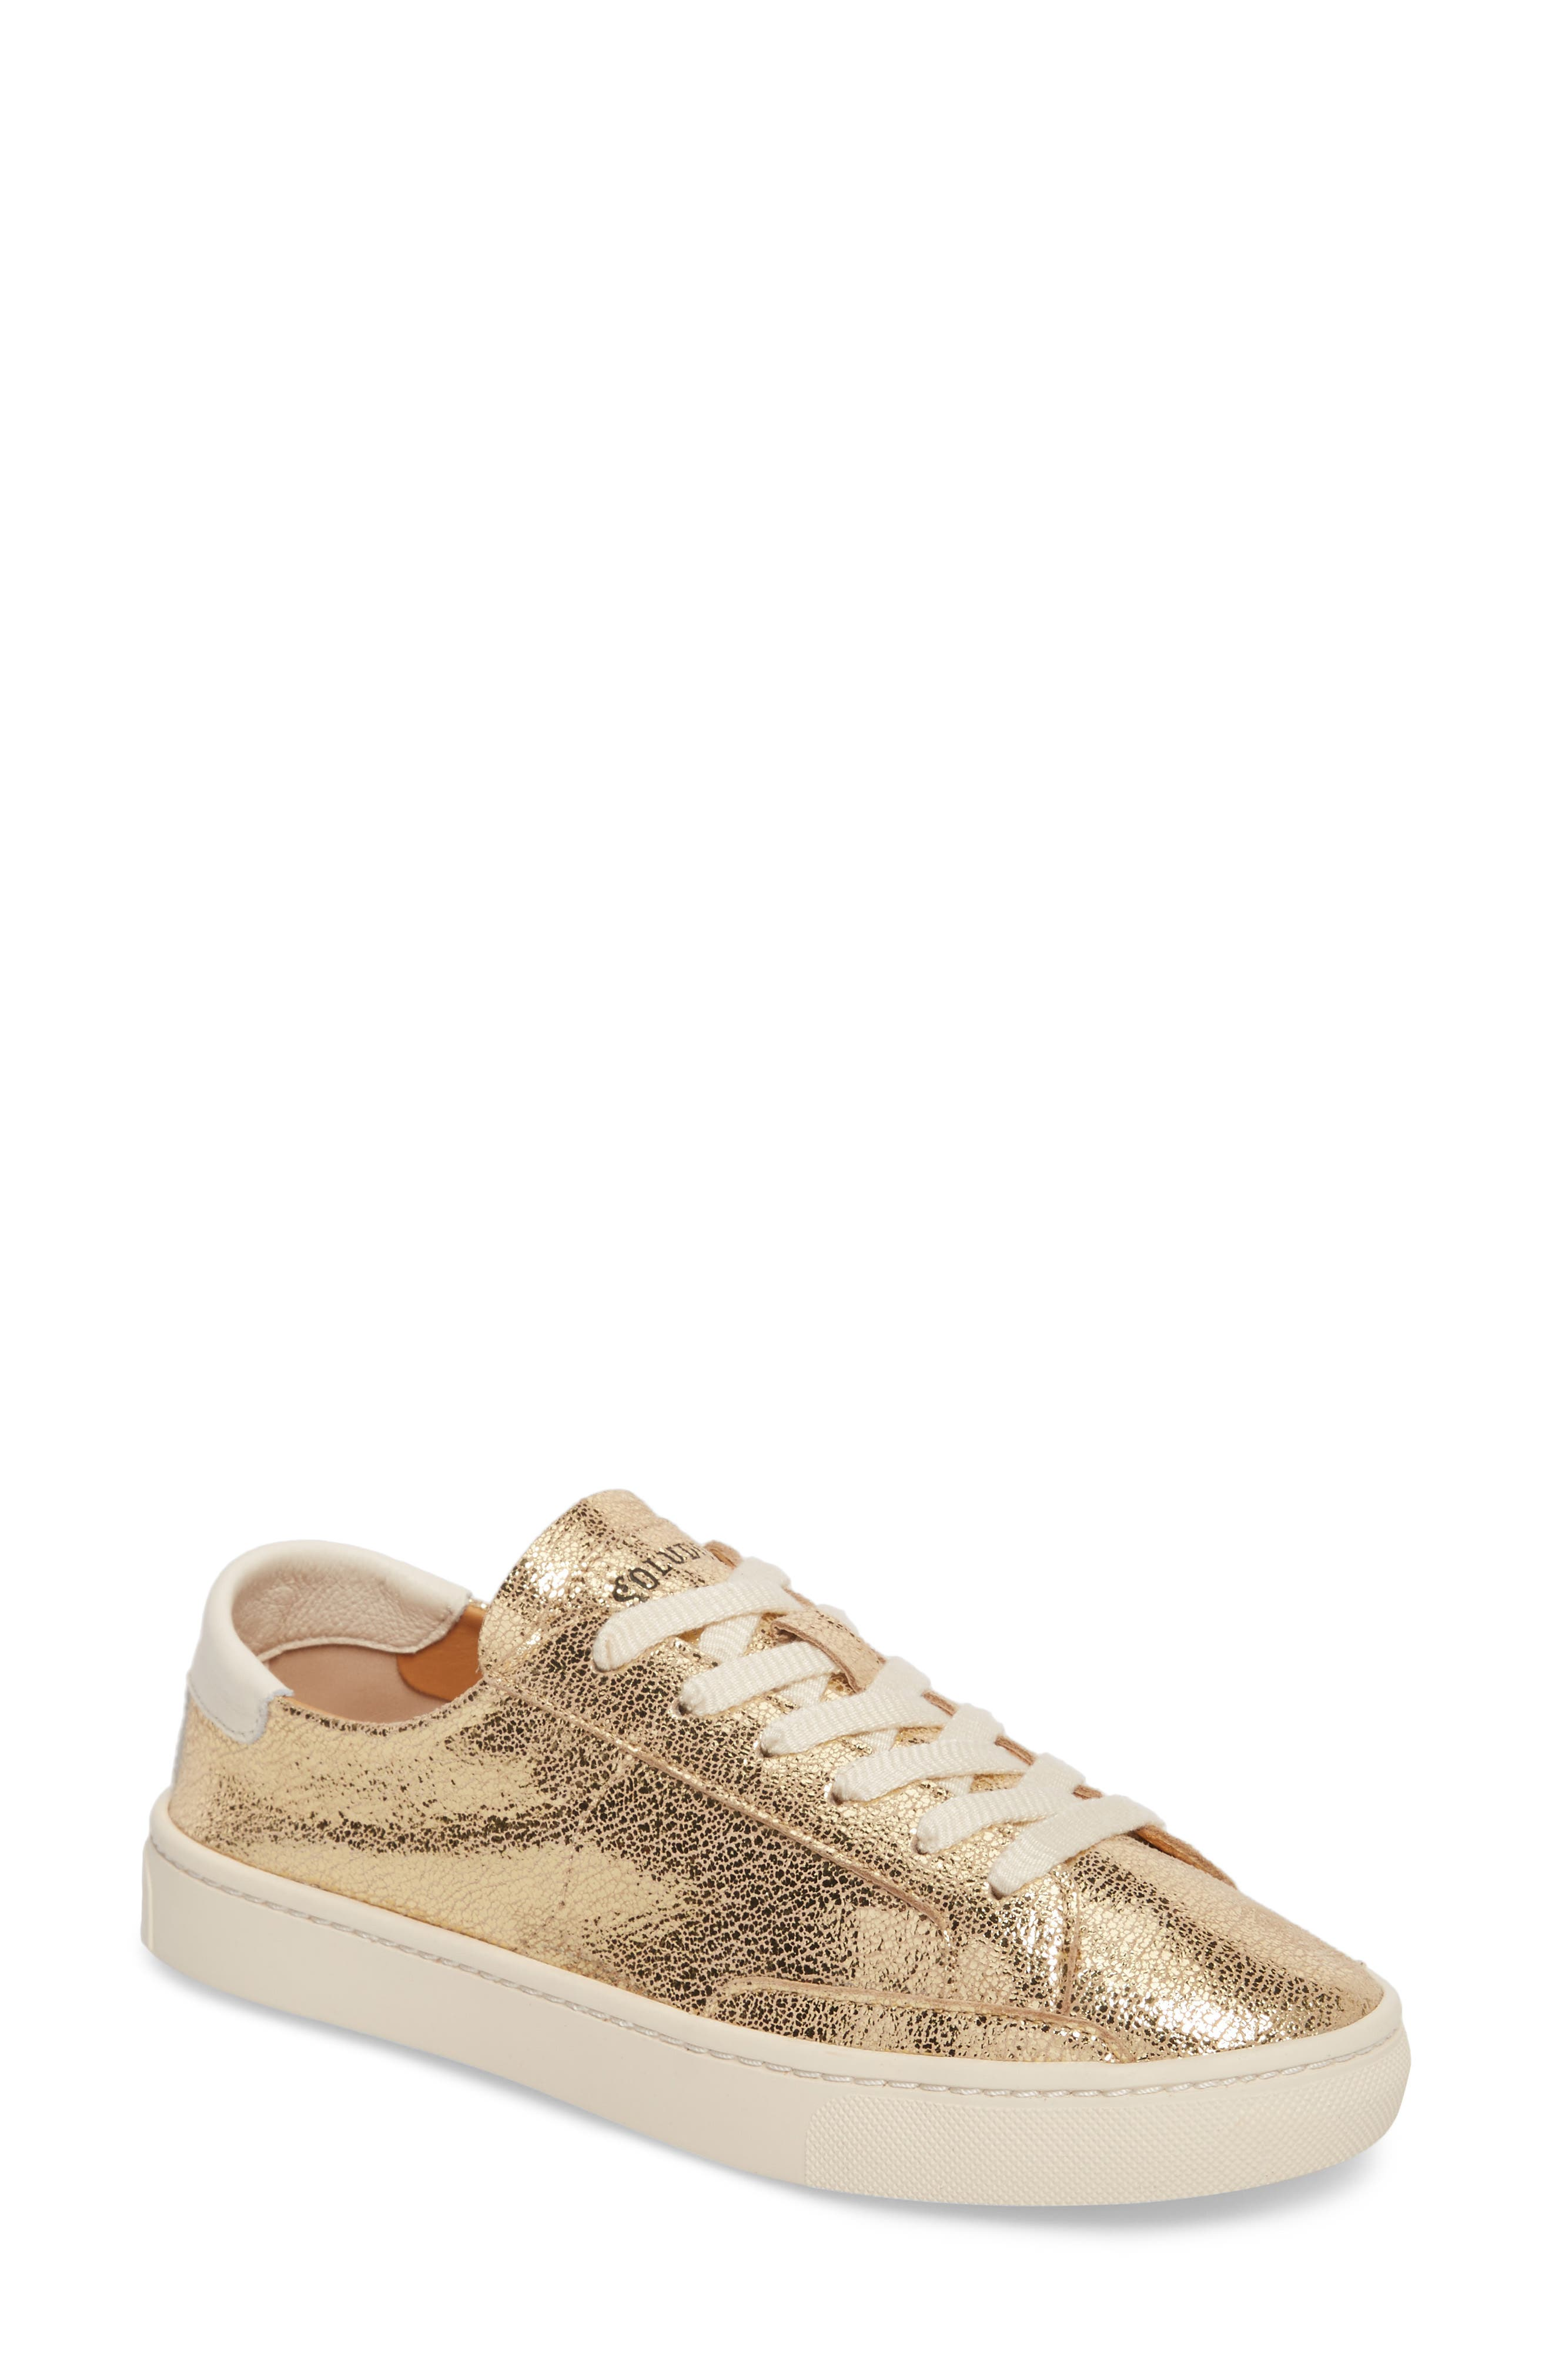 Ibiza Metallic Lace-Up Sneaker,                         Main,                         color, 711